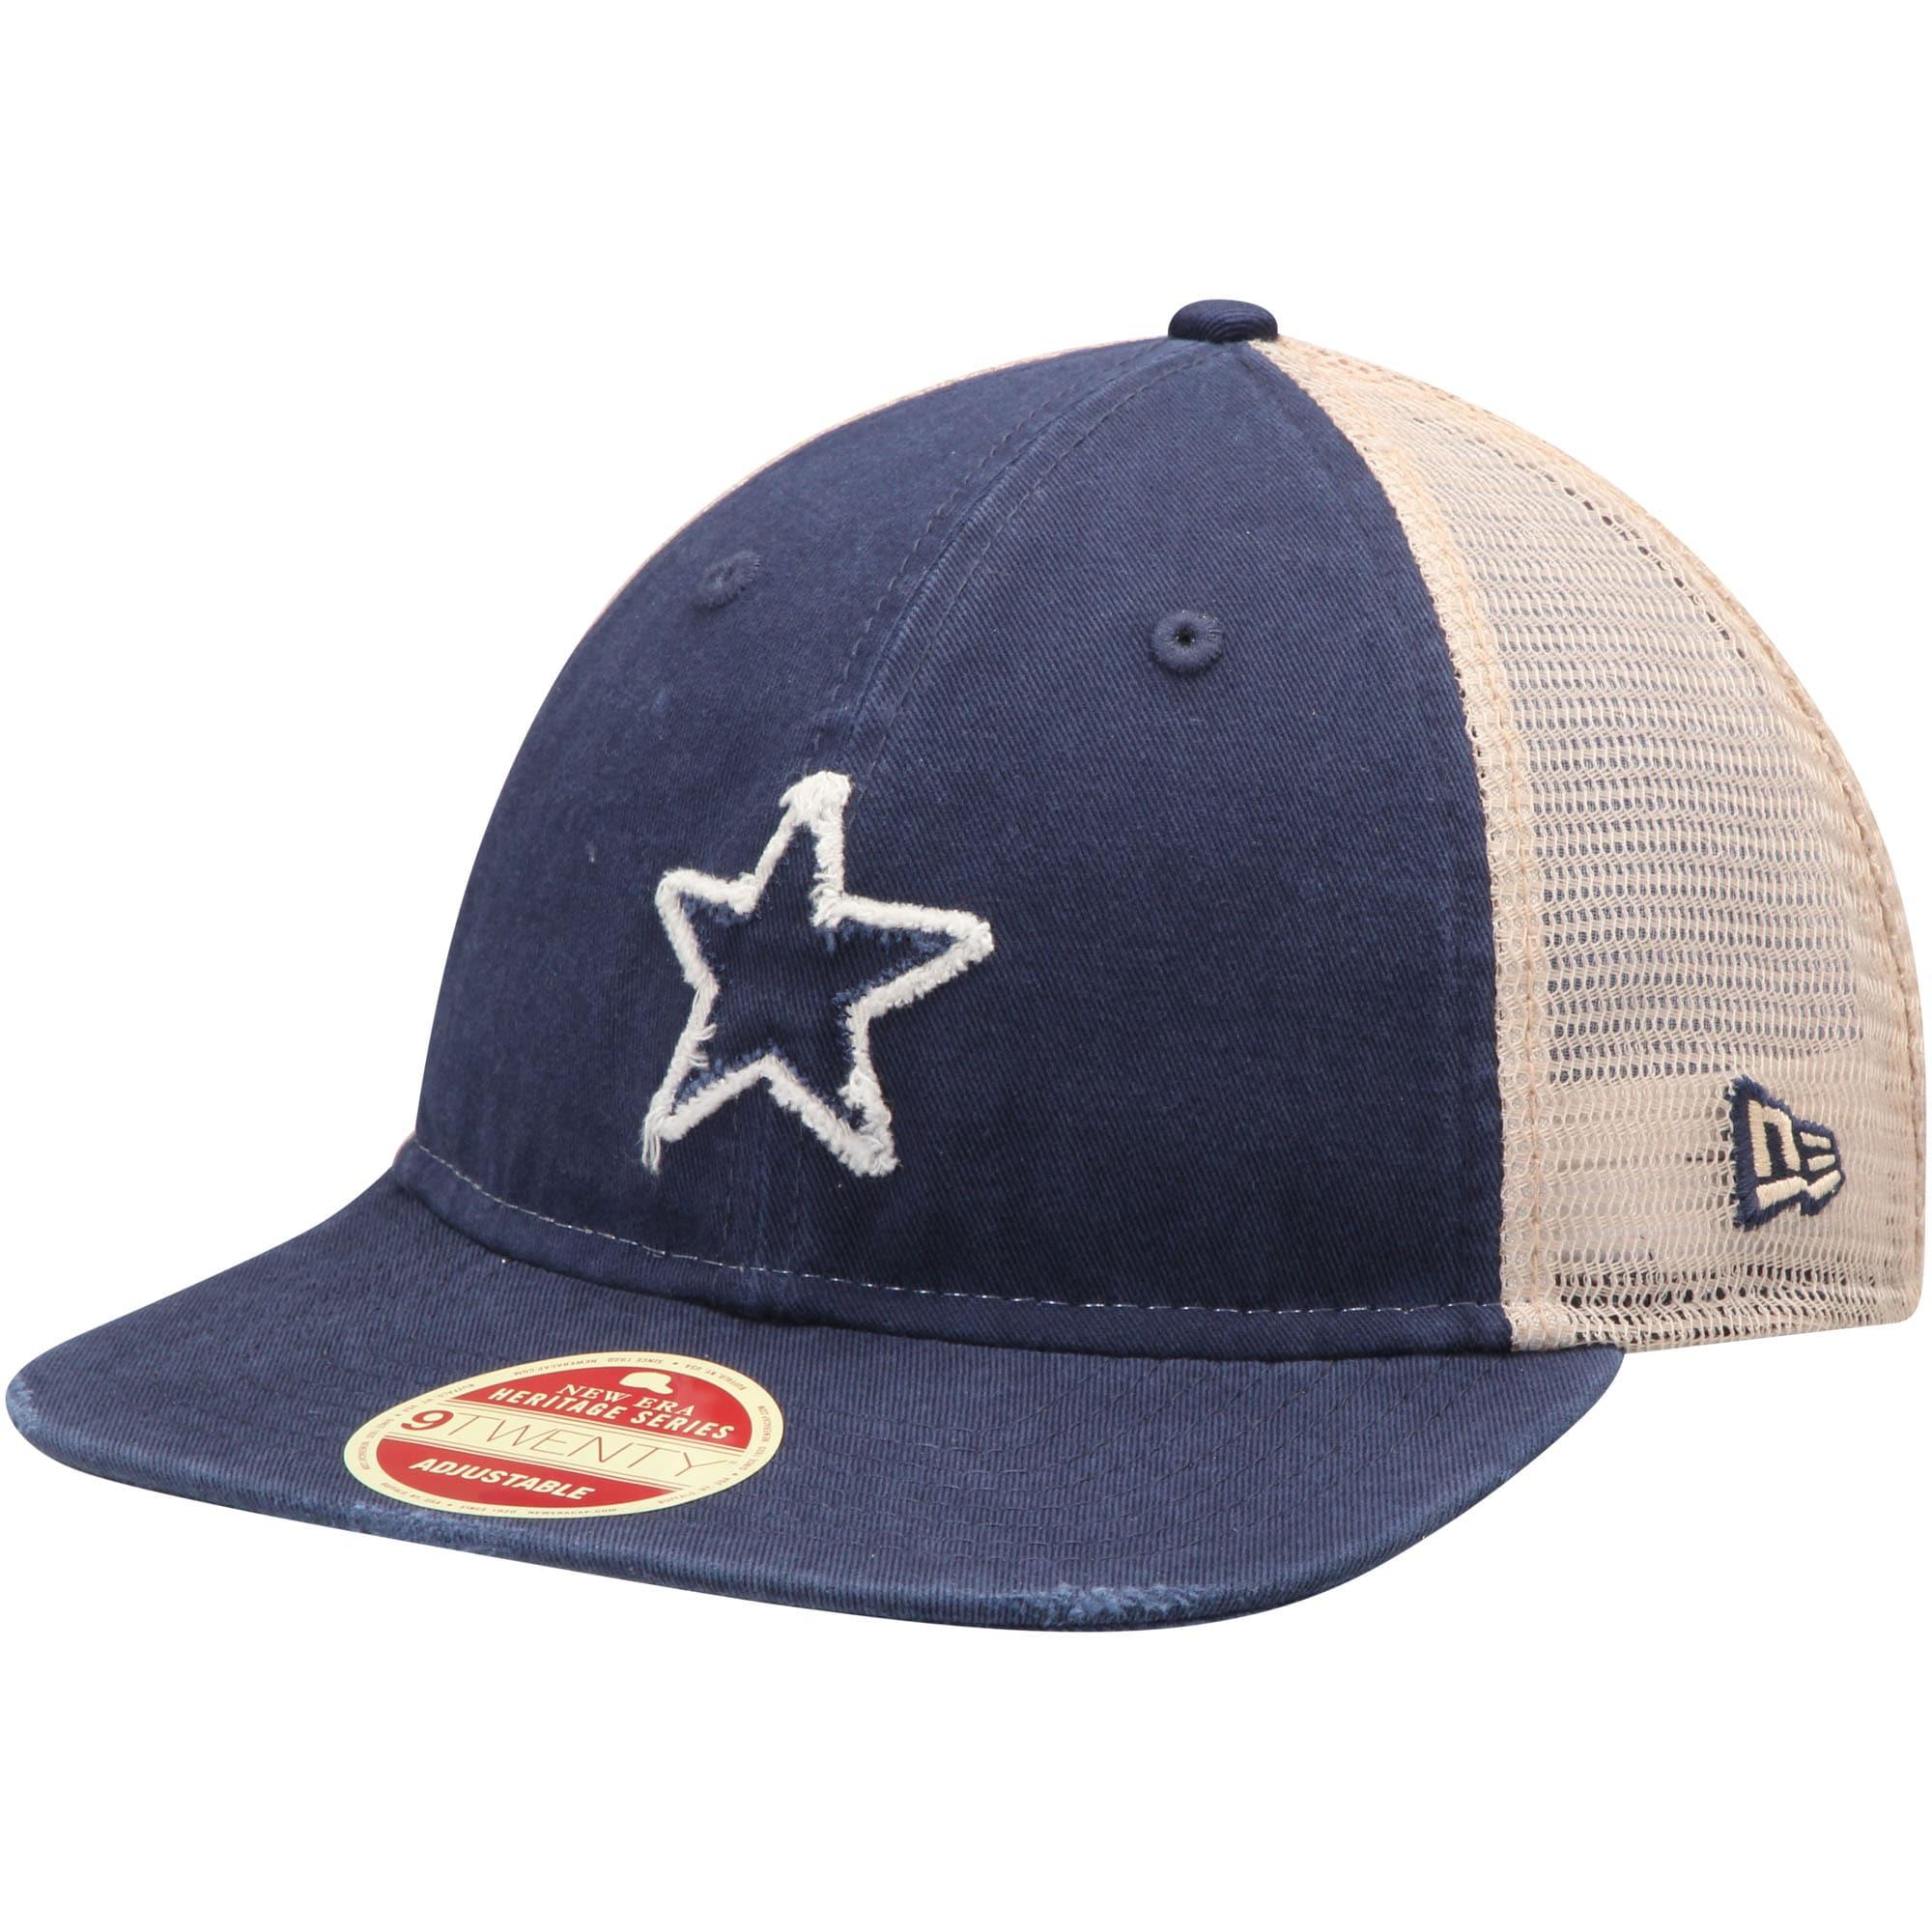 Dallas Cowboys New Era Frayed Twill 2 9TWENTY Adjustable Hat - Navy/Natural